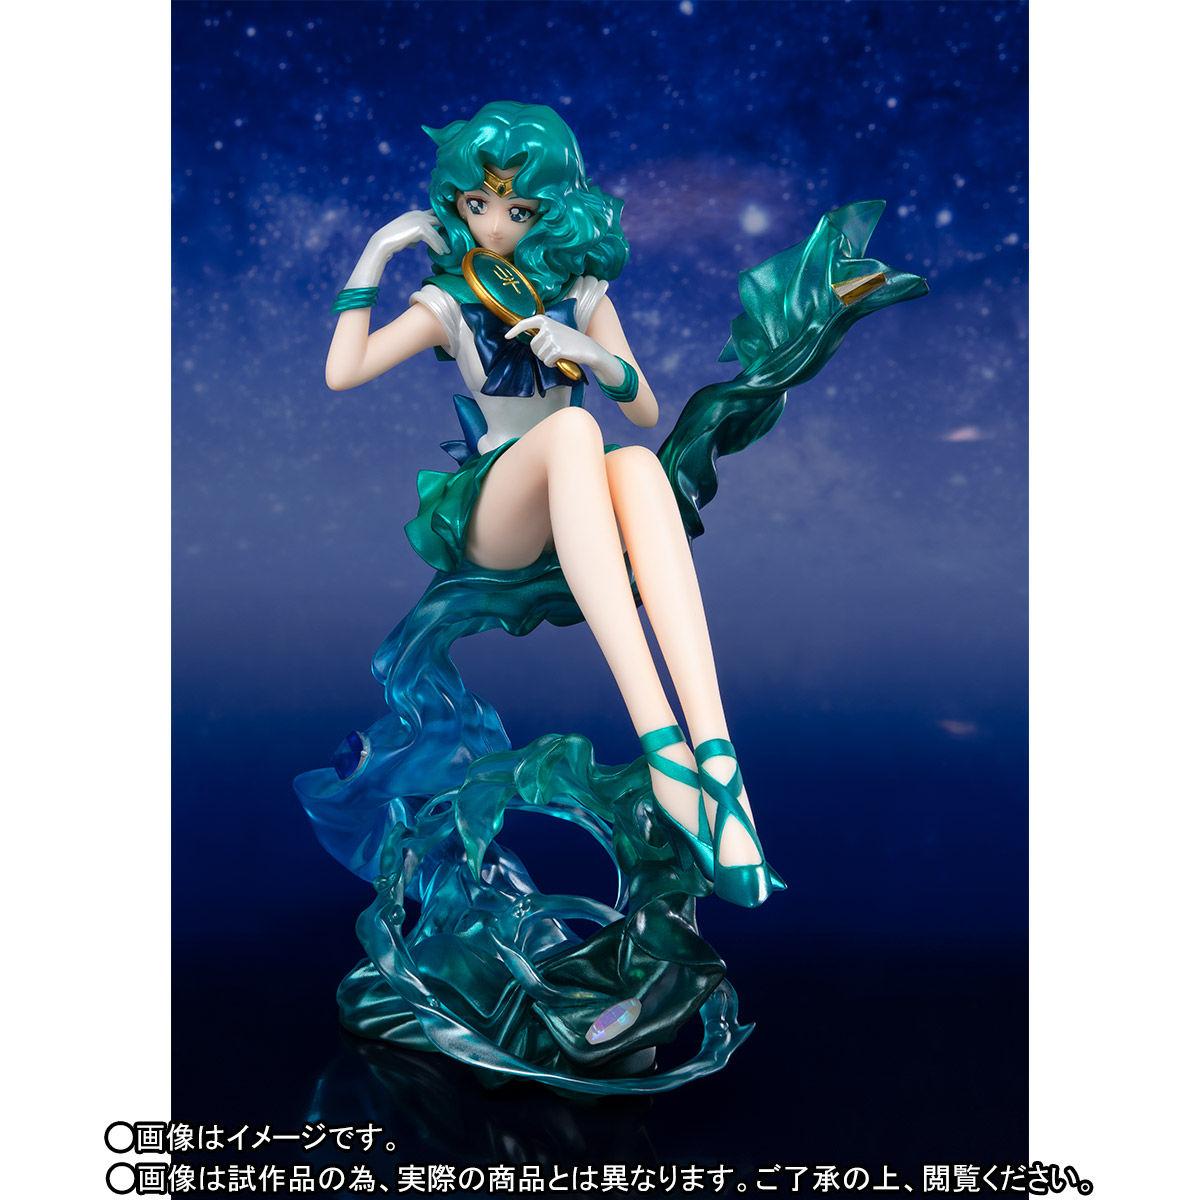 Figuarts Zero chouette『セーラーネプチューン』美少女戦士セーラームーン 完成品フィギュア-003